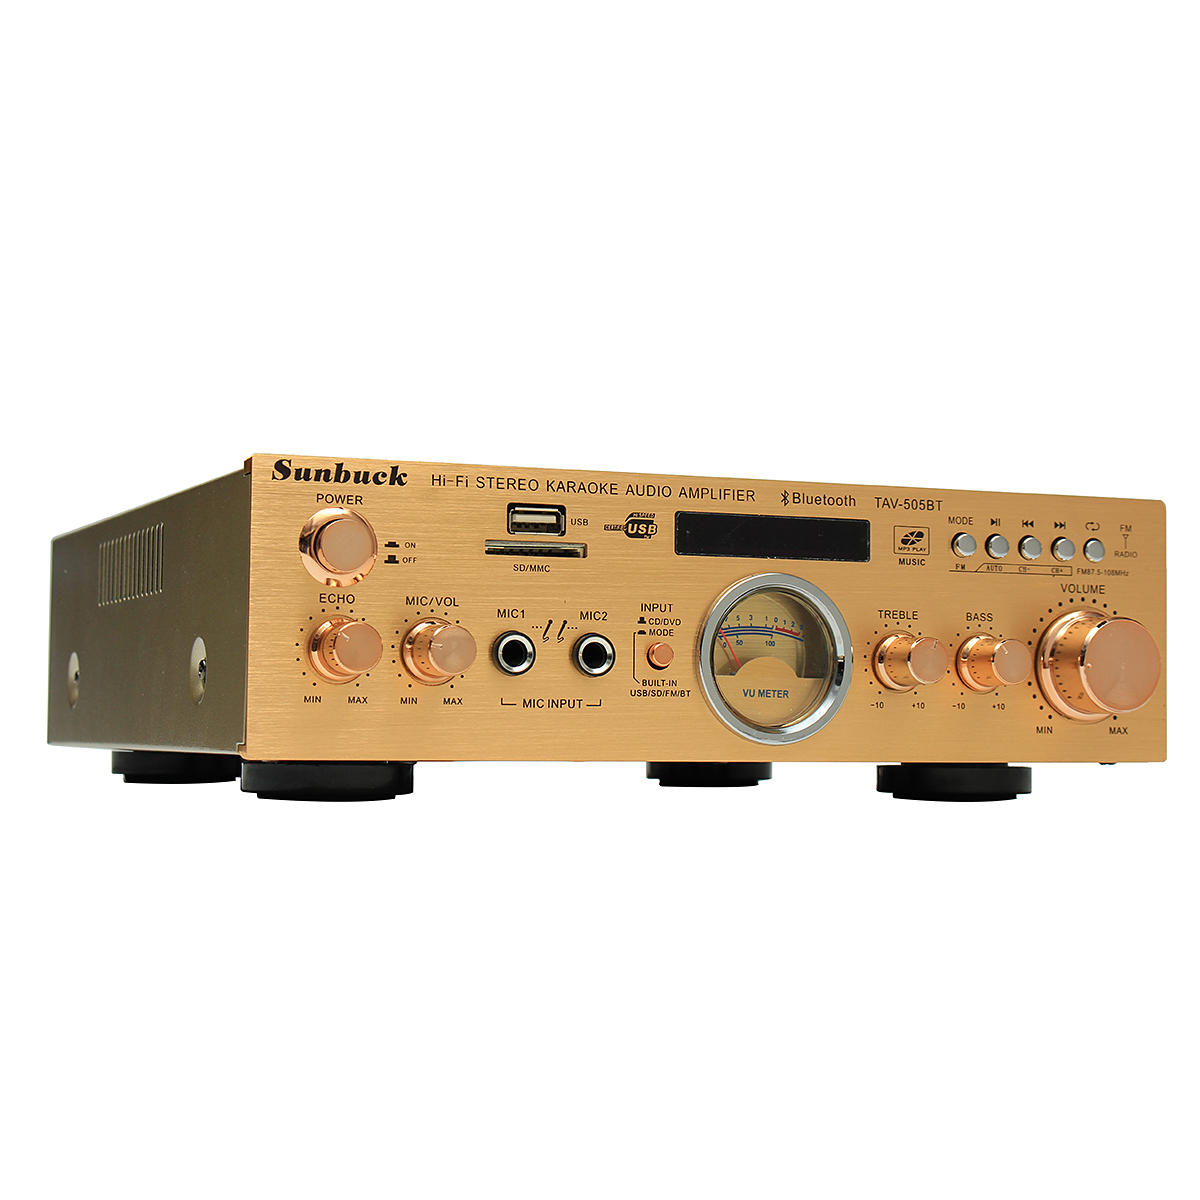 Amazing Sunbuck Tav 505Bt 400W 400W Hifi Bluetooth Power Vu Meter Amplifier Wiring Cloud Rineaidewilluminateatxorg